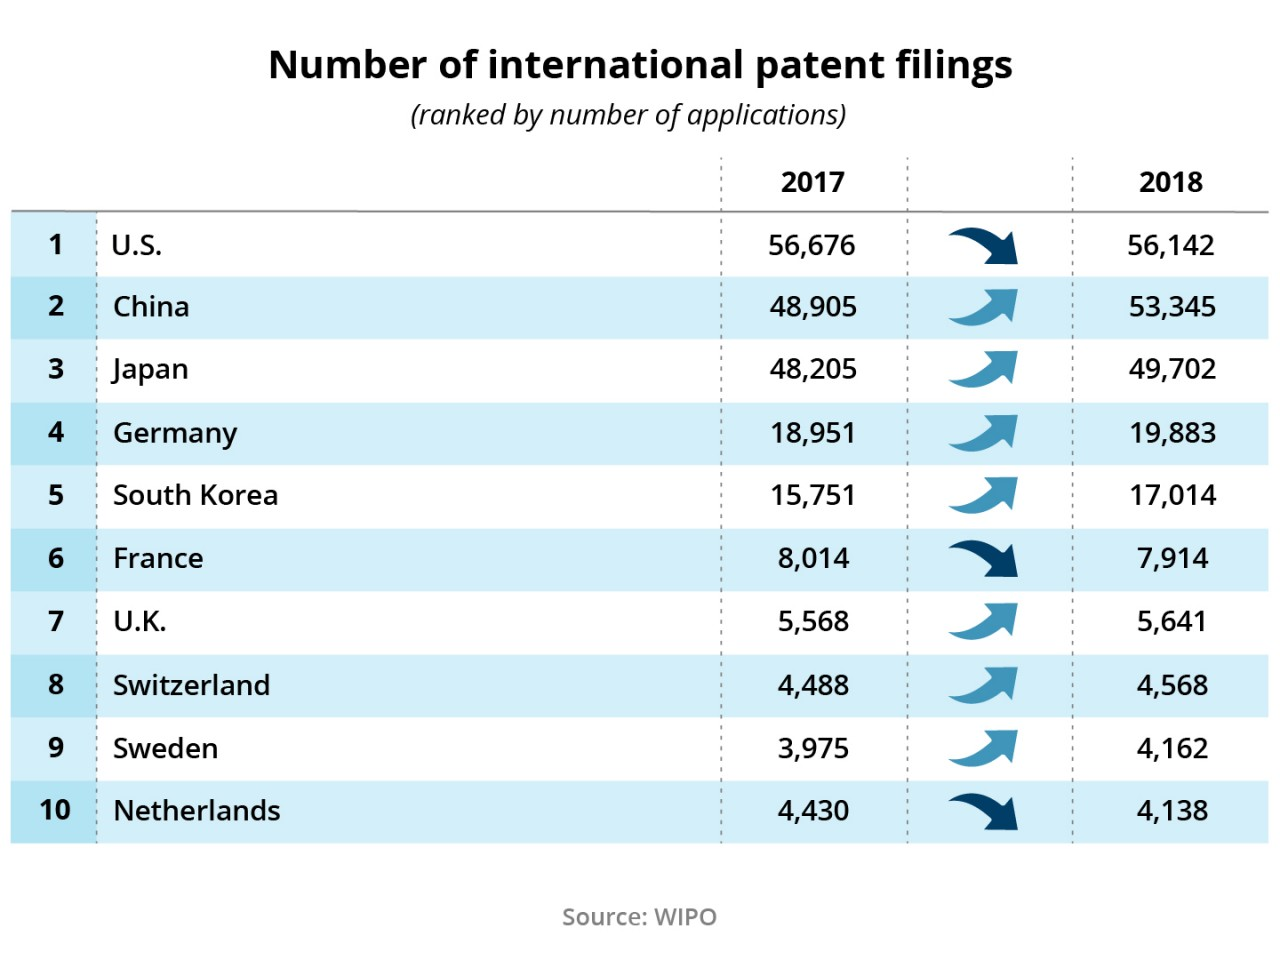 Figure 8: Number of international patent filings